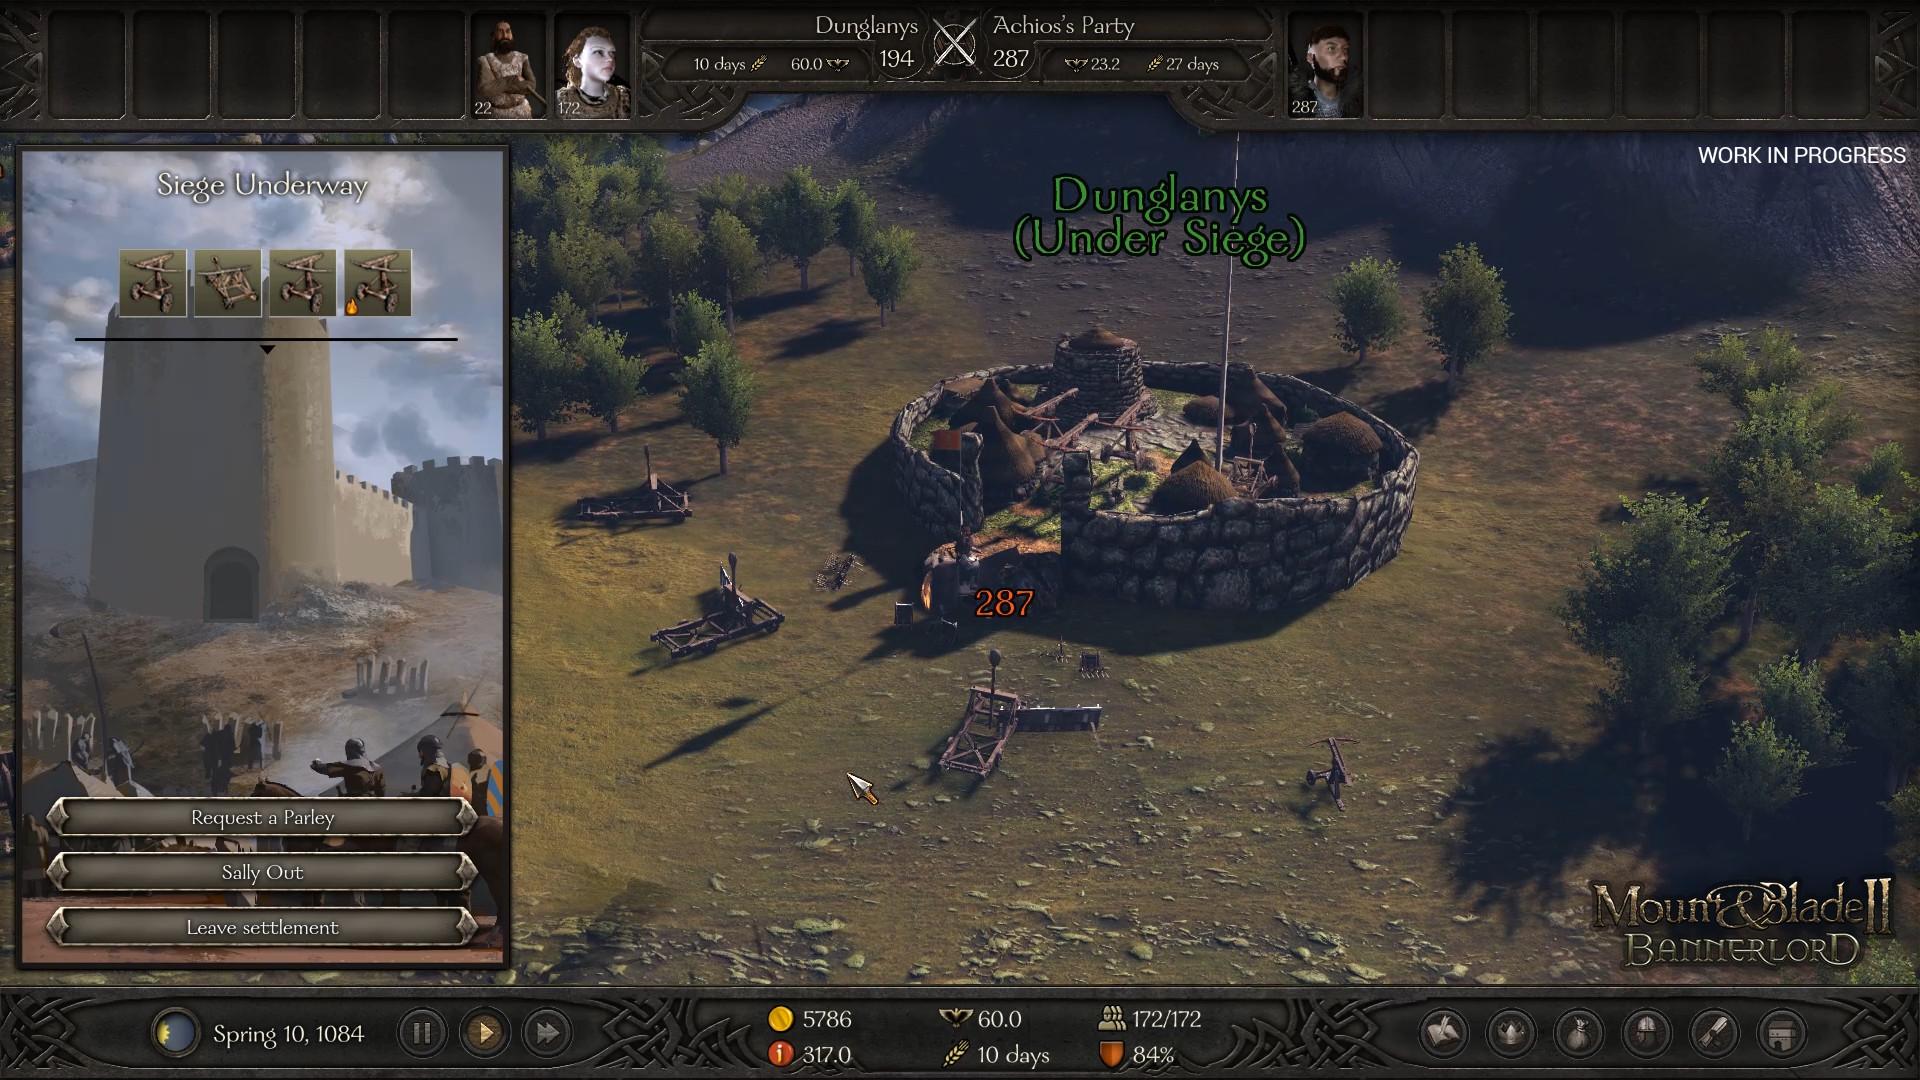 Diario semanal de desarrollo de Bannerlord 46: Entrevista a Ozan Gümüş Mount_and_blade_under_seige